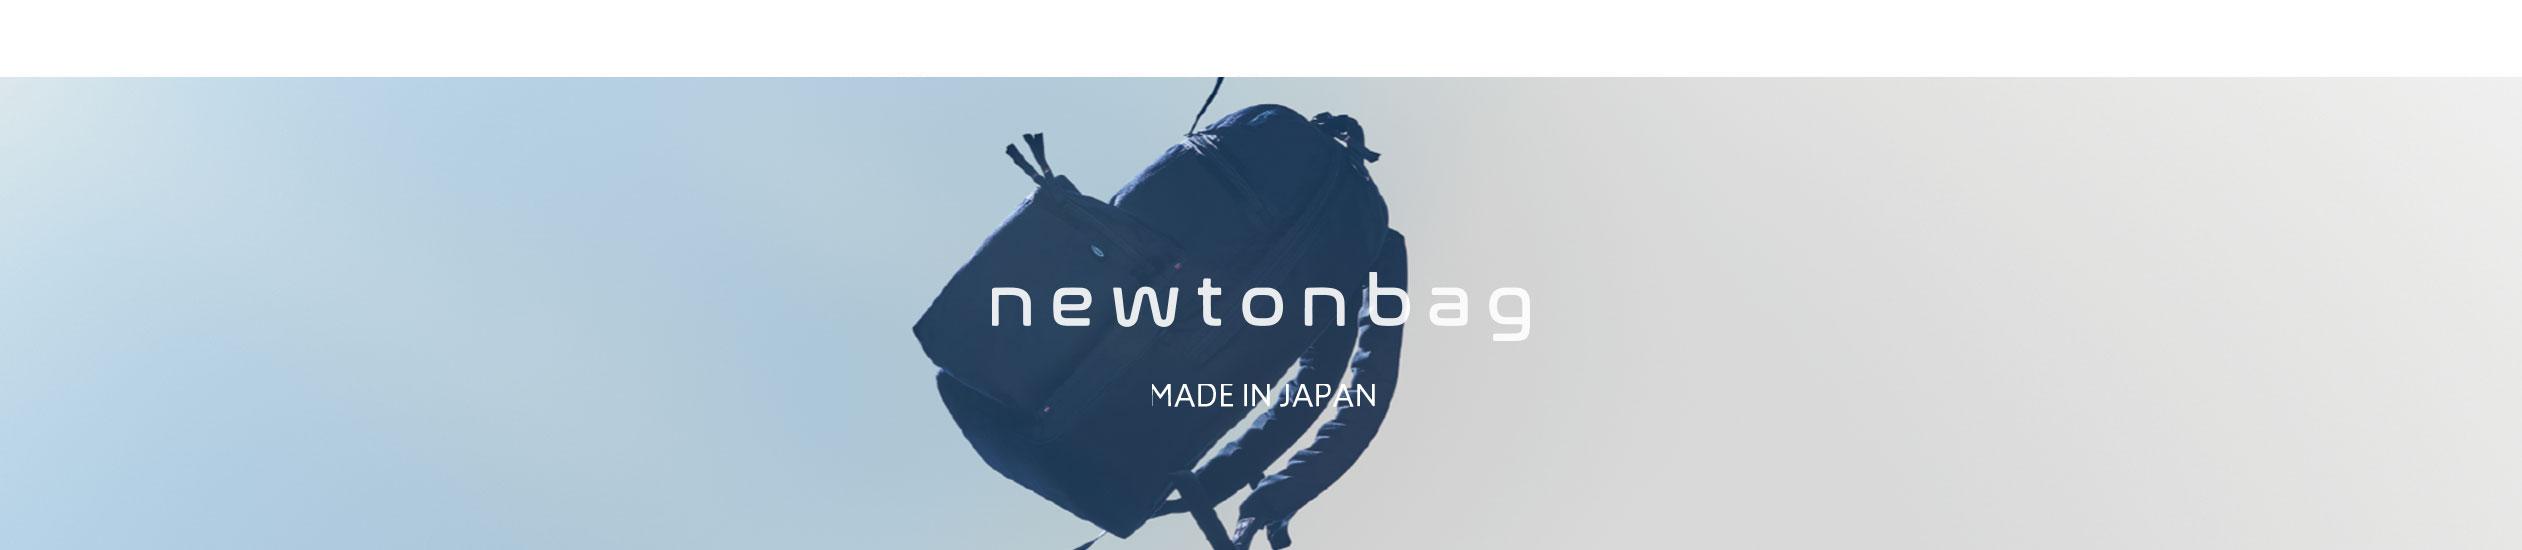 NEWTONBAG